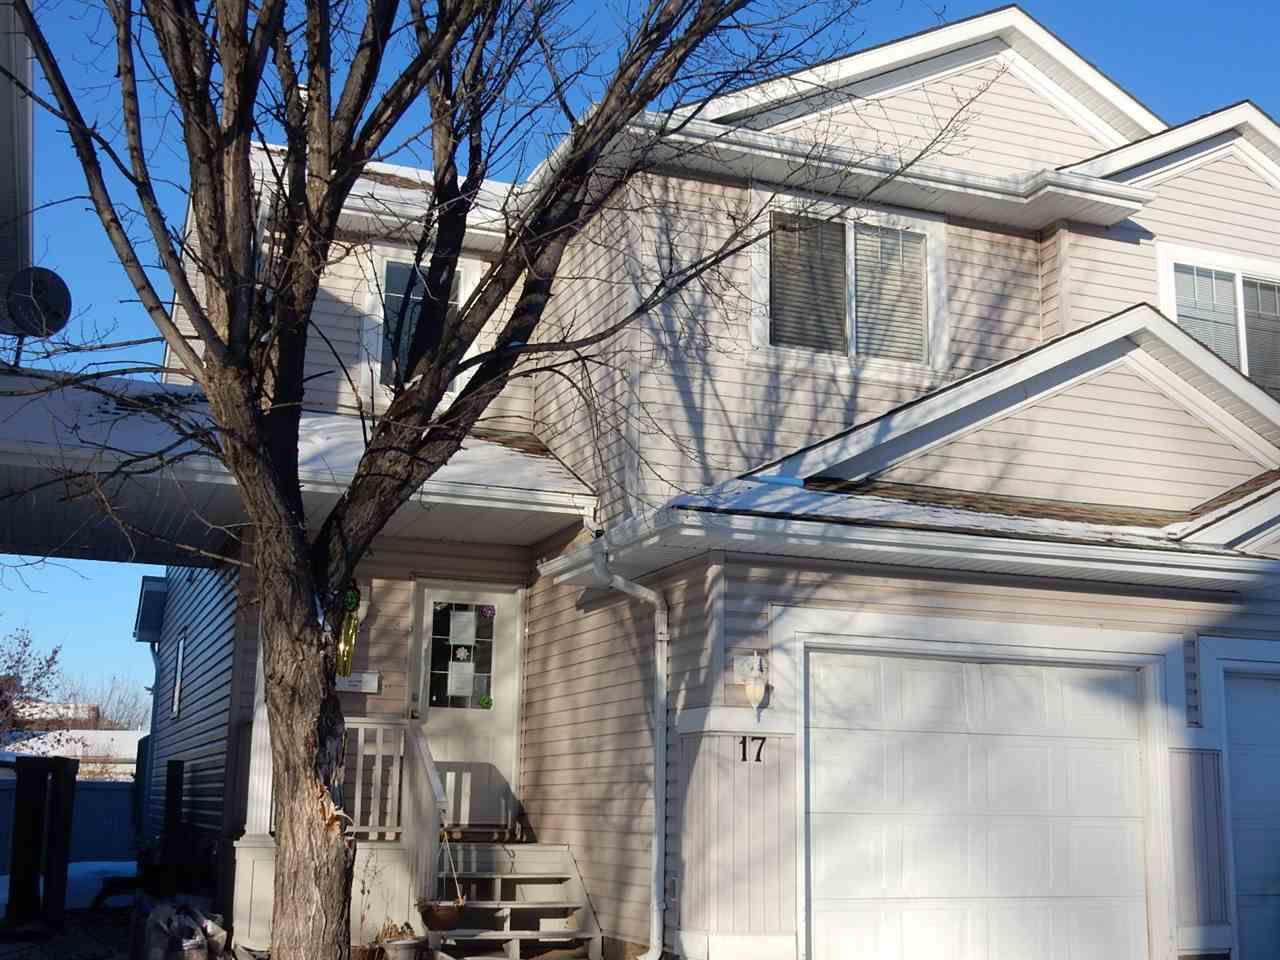 Main Photo: 17 4020 21 Street in Edmonton: Zone 30 Townhouse for sale : MLS®# E4146749